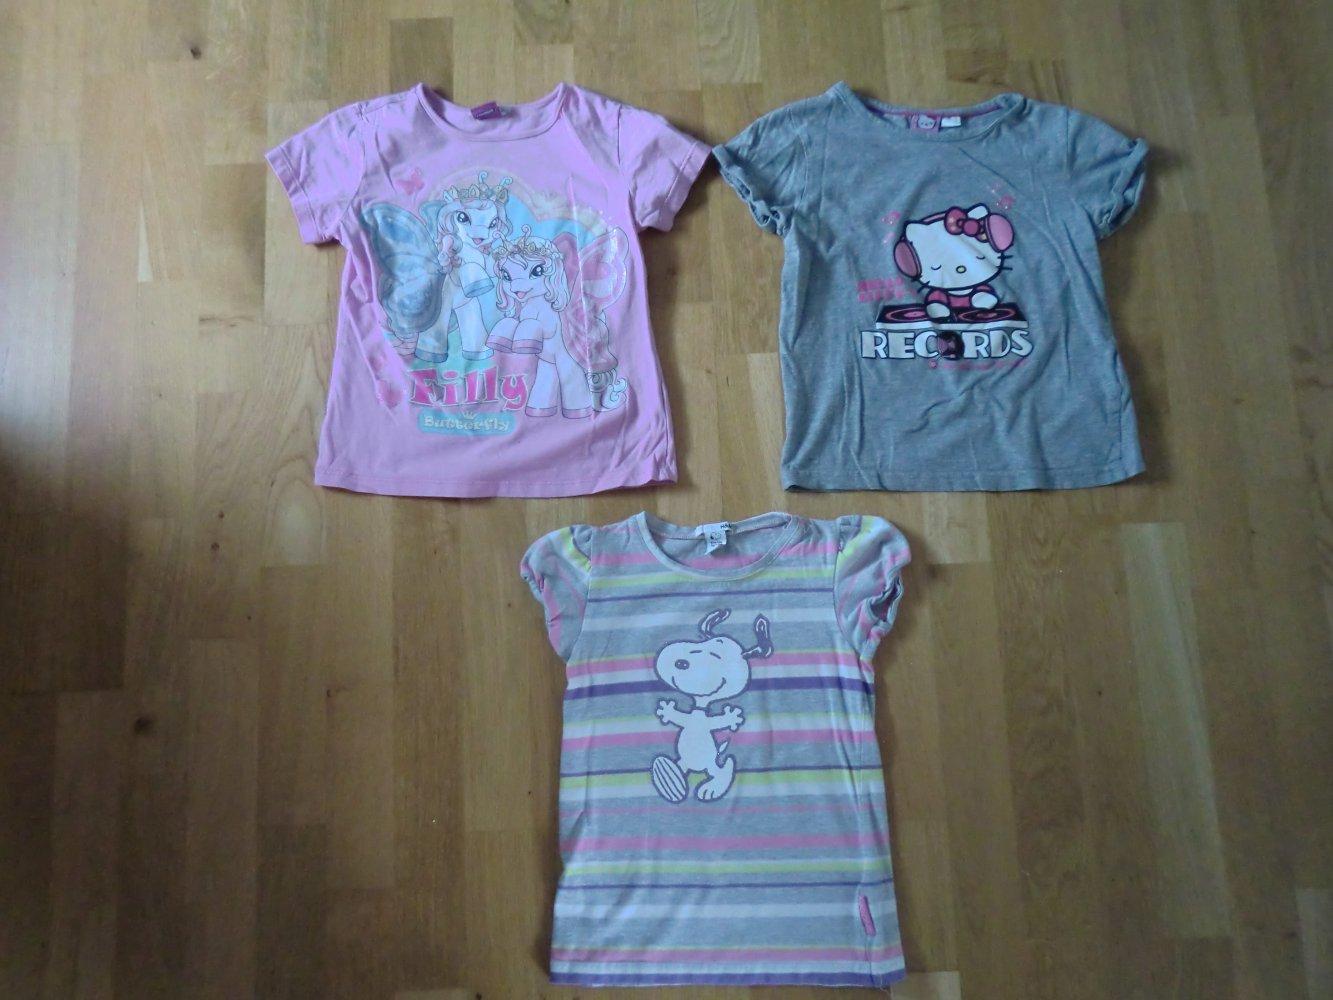 208c5d6d274480 H&M - 3 süsse T-Shirts für Mädchen Snoopy Hello Kitty Filly ...